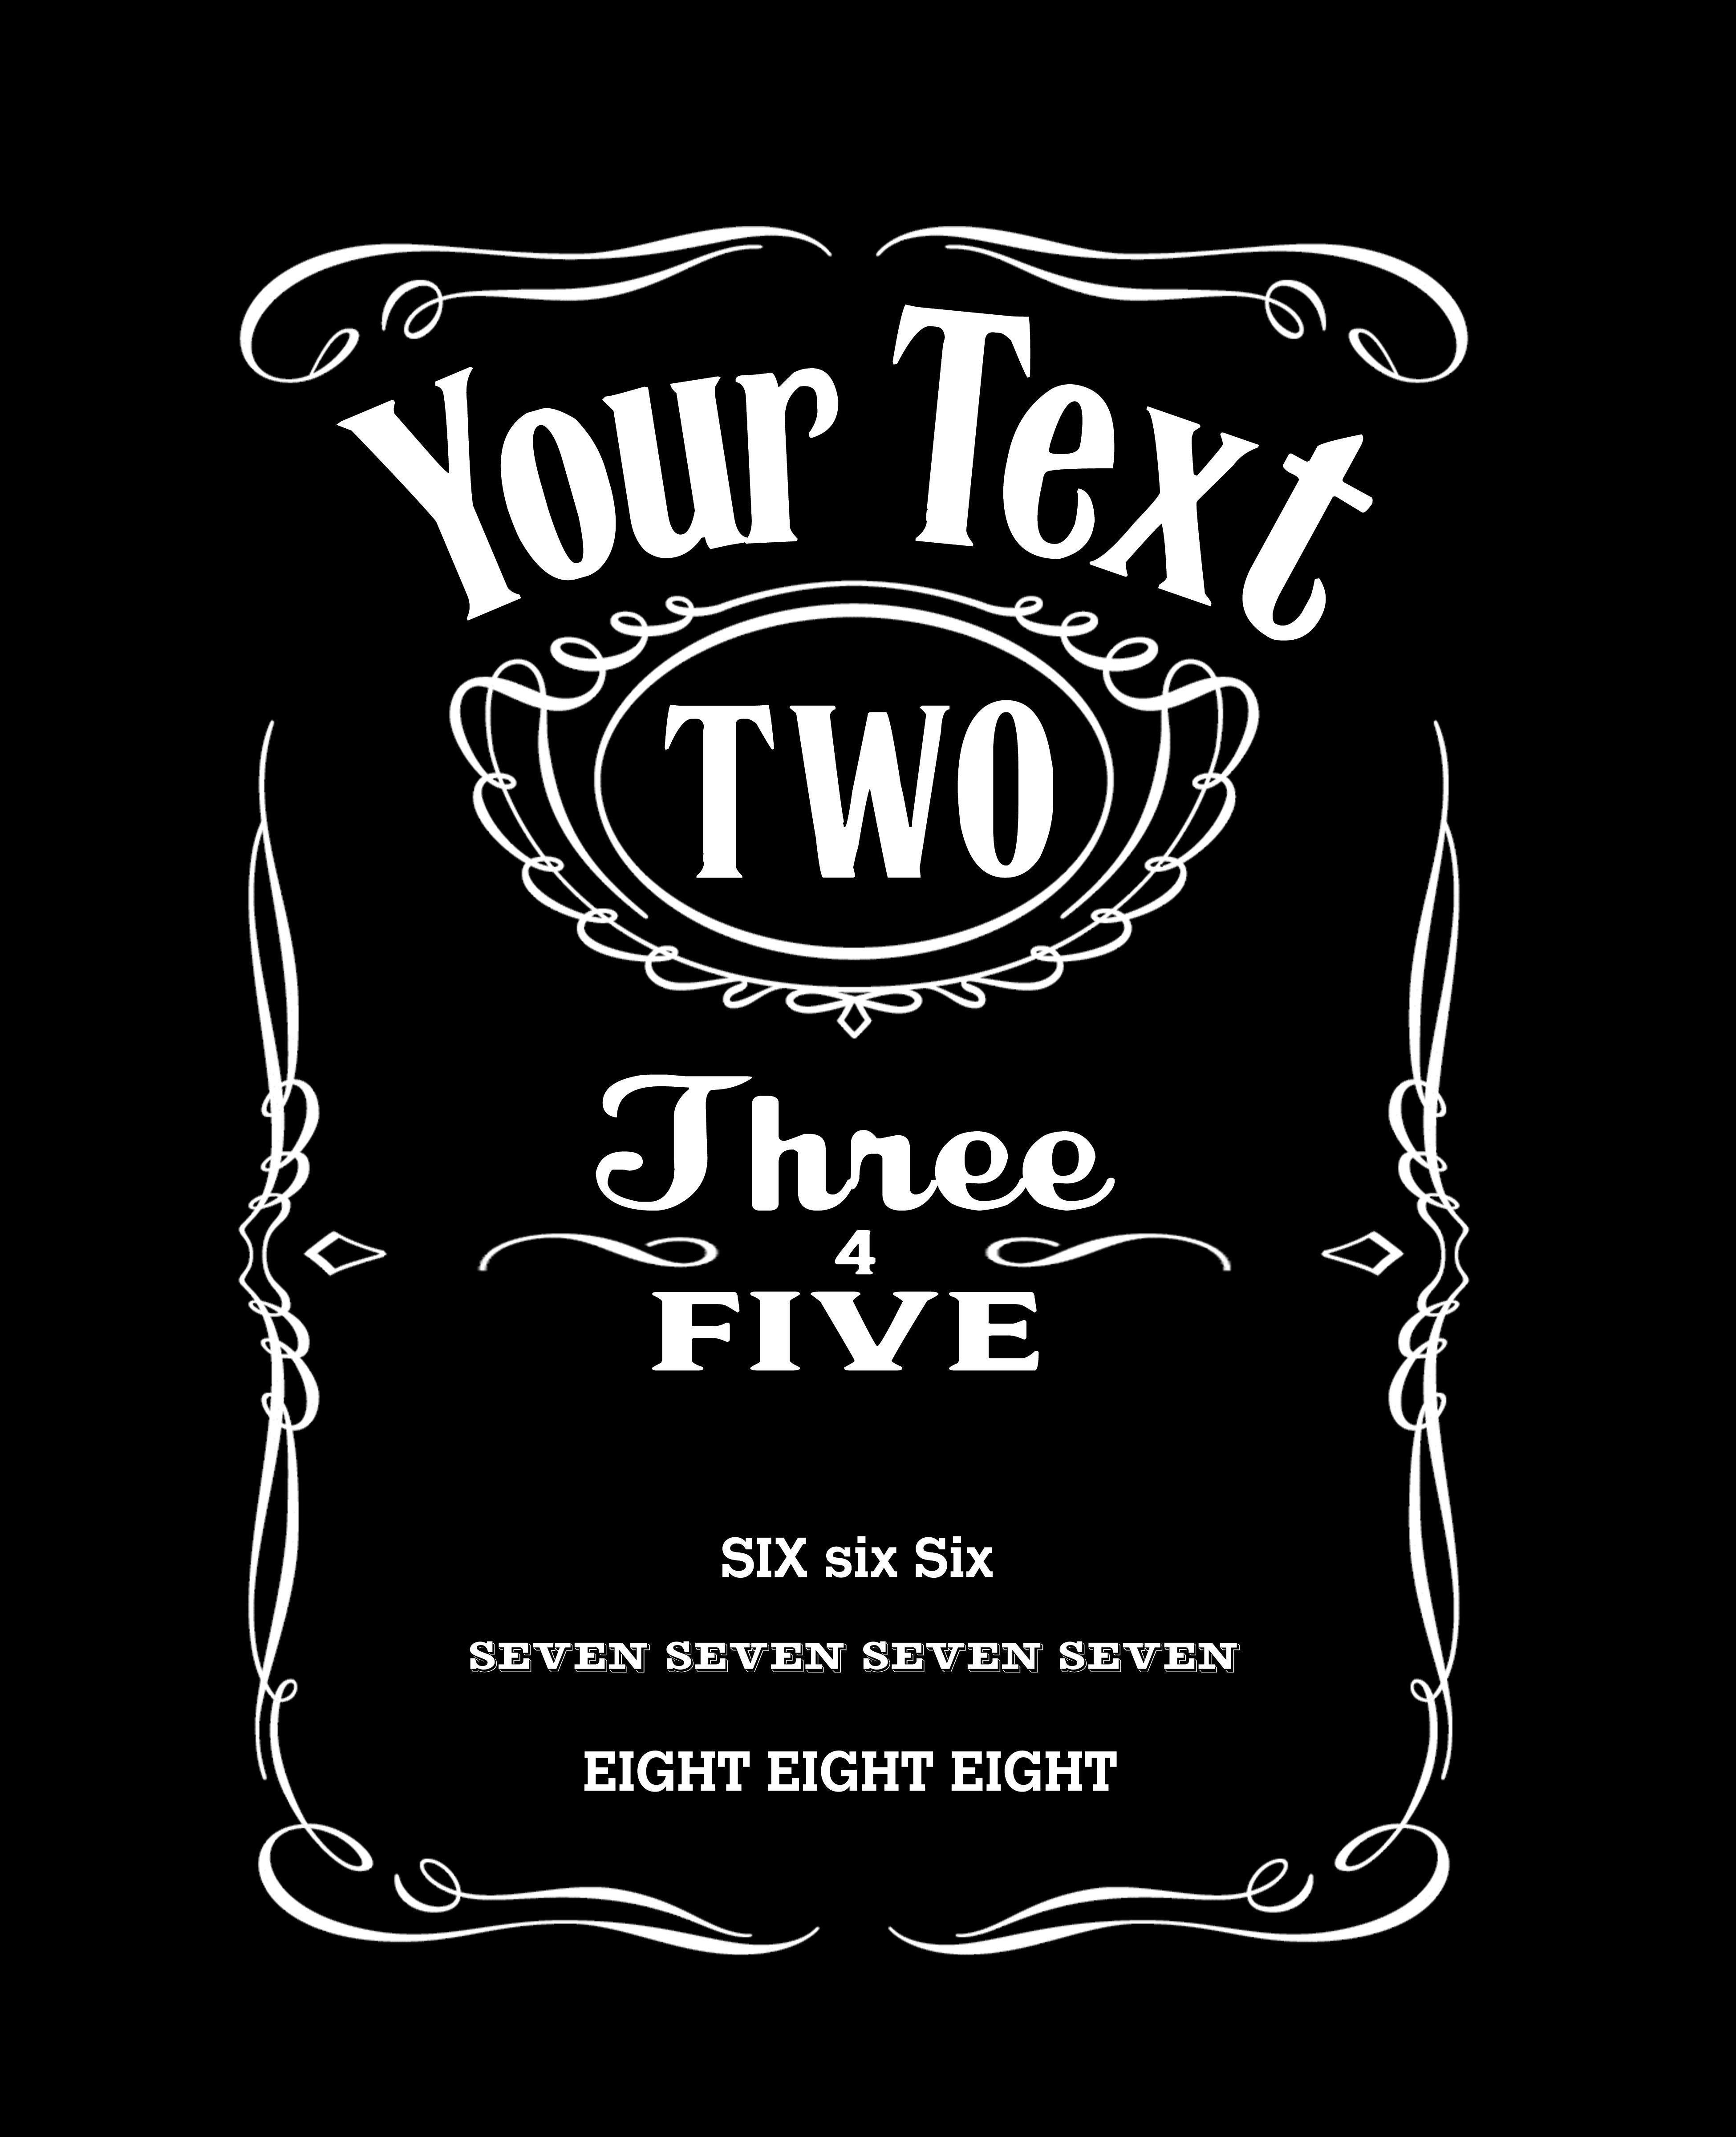 Custom Jack Daniels T Shirt From Brian E Fisher Jack Daniels Label Label Templates Jack Daniels